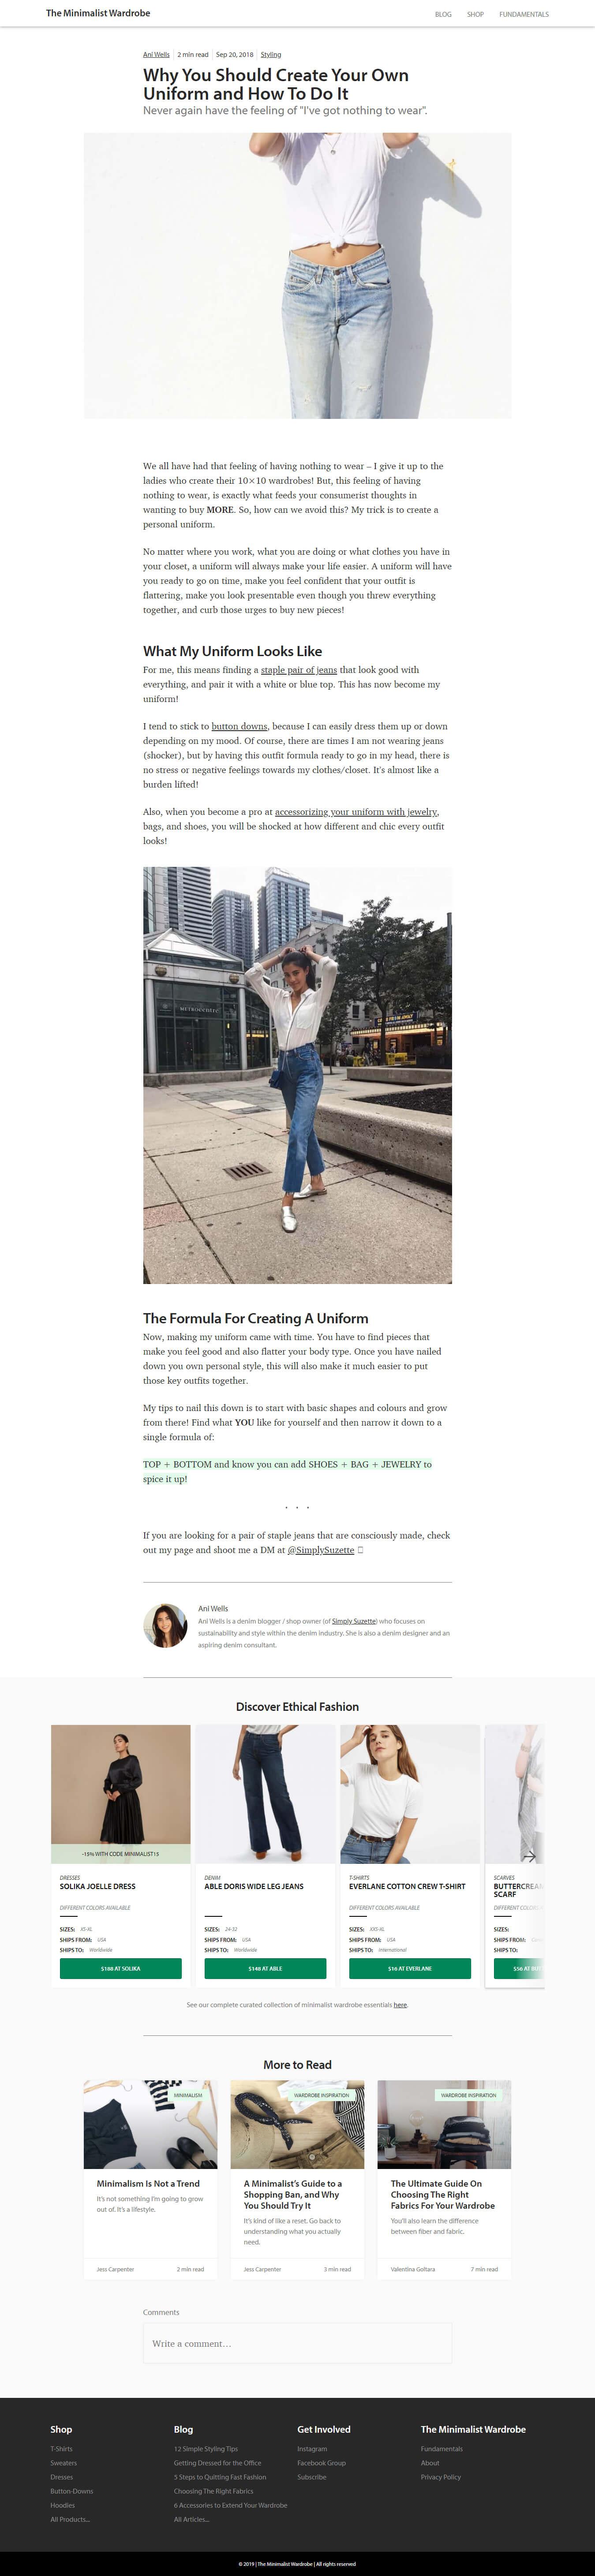 Minimize Your Wardrobe – The Minimalist Wardrobe